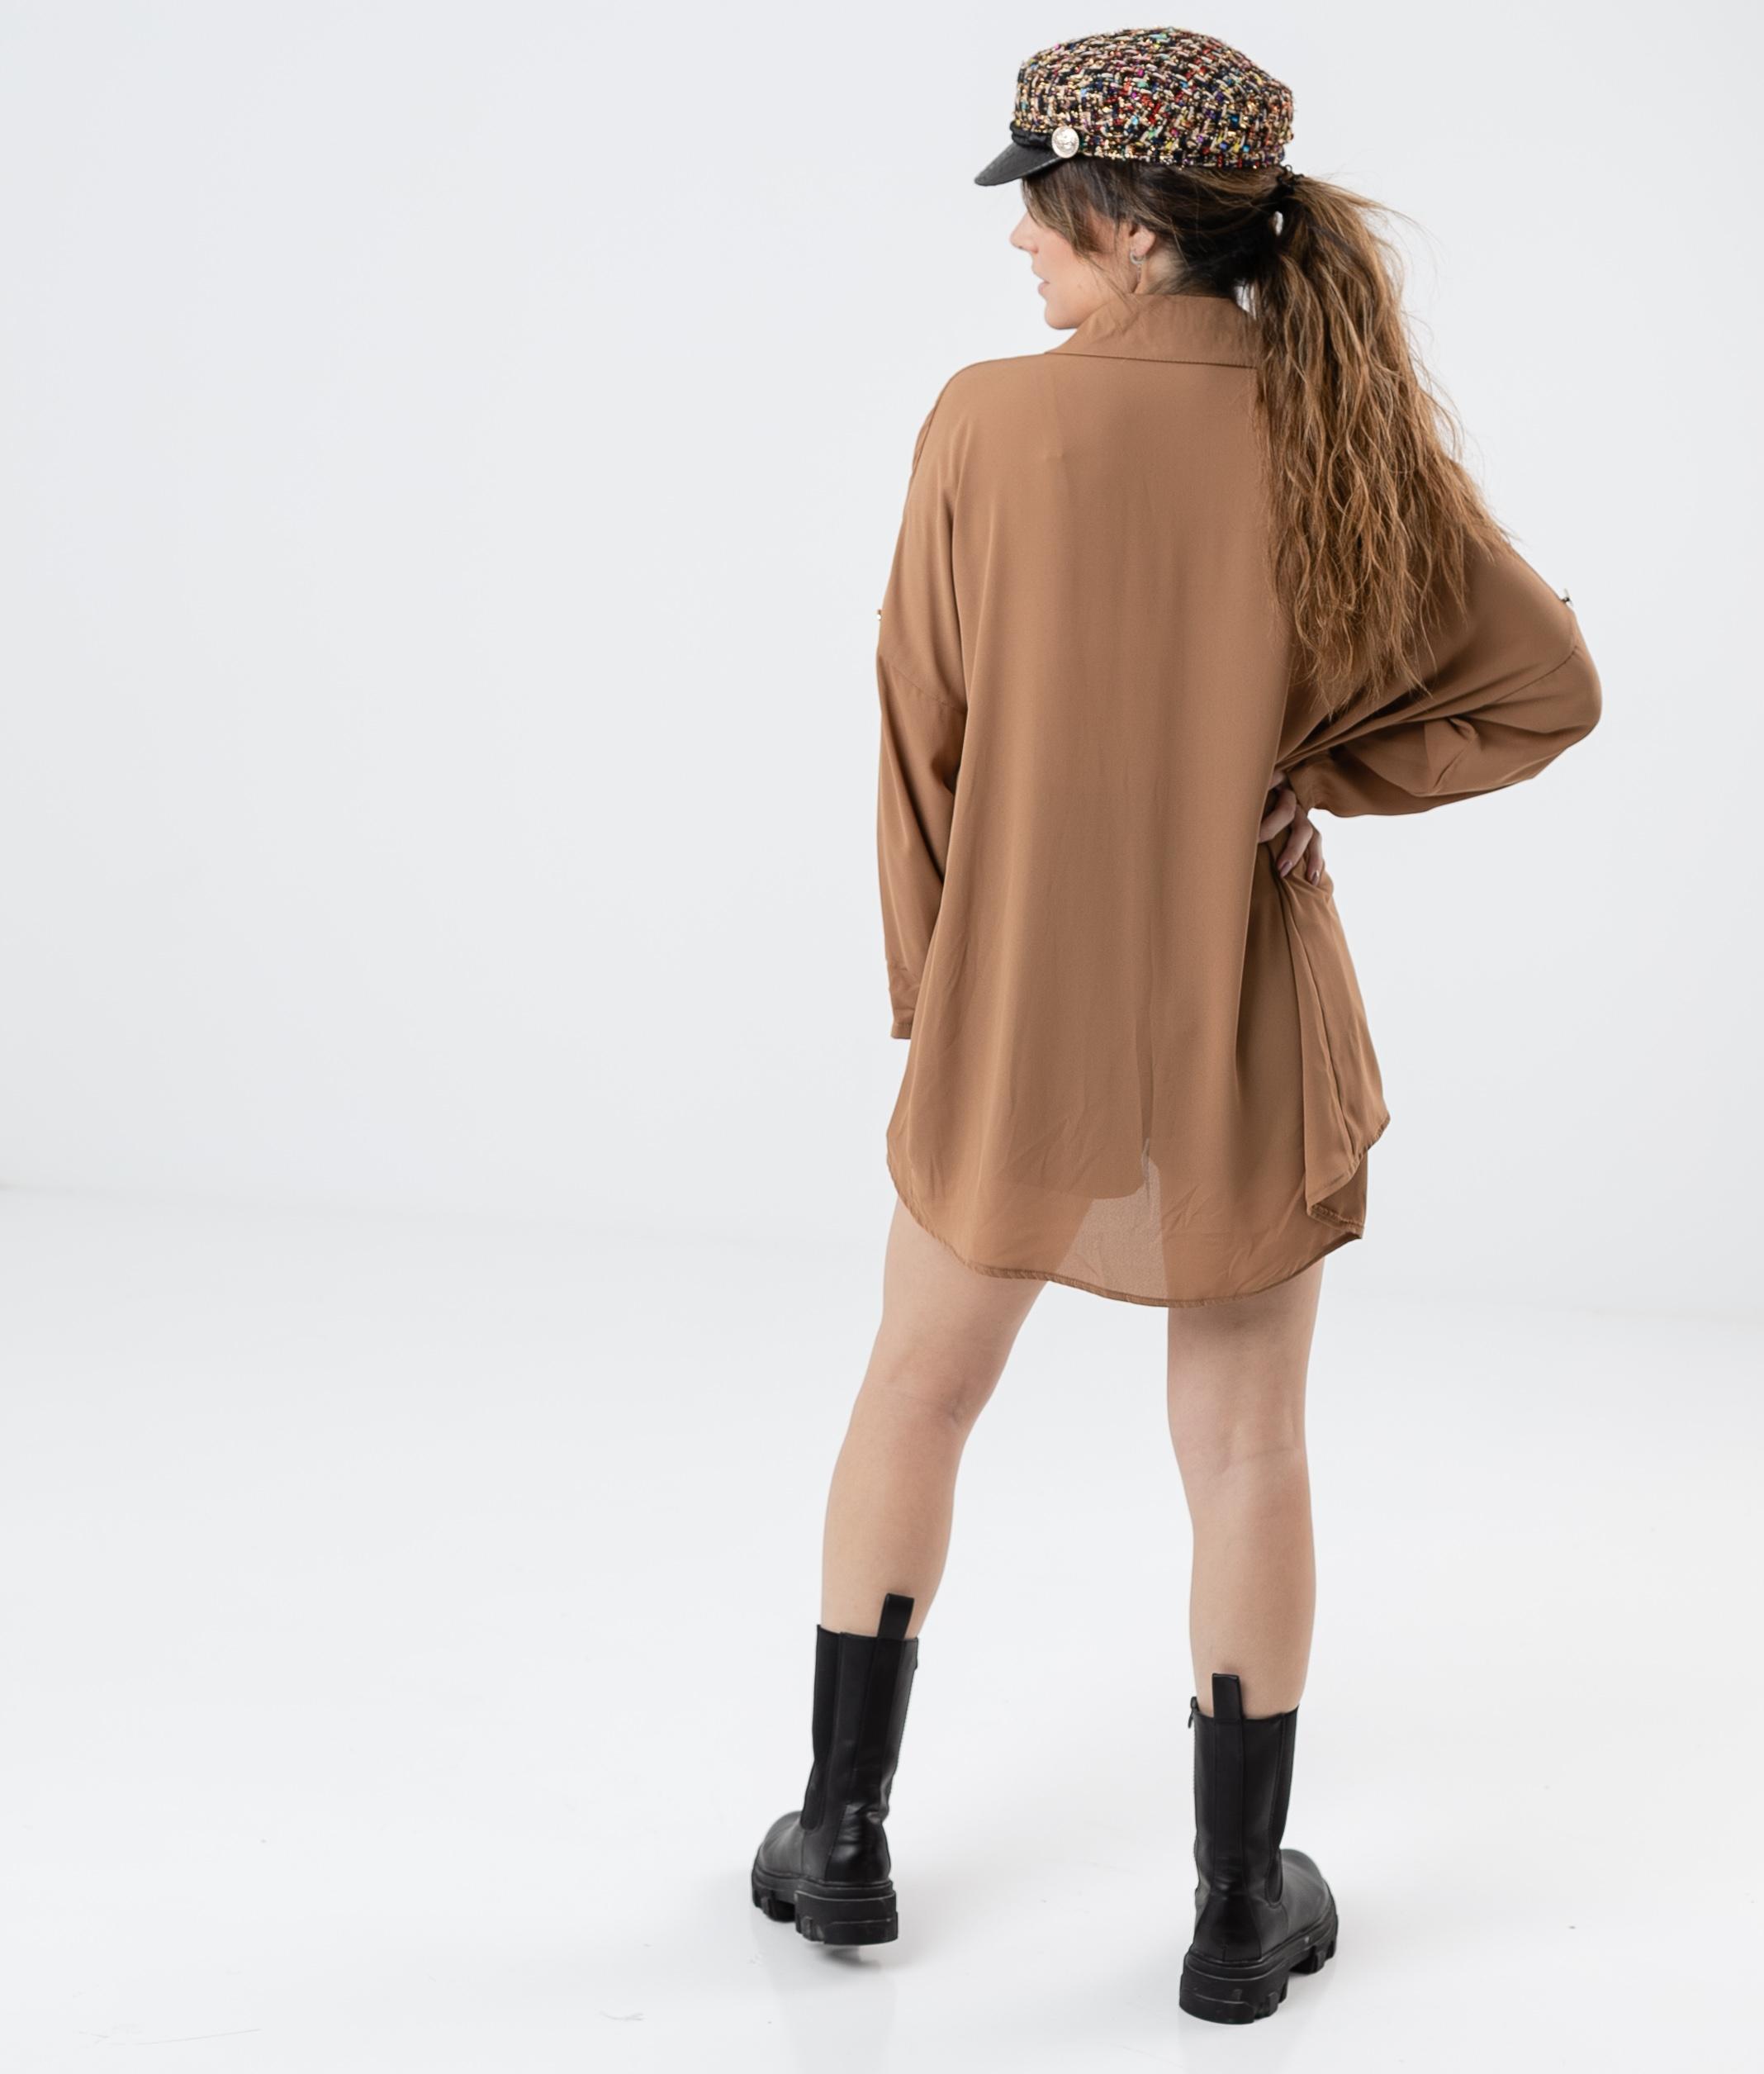 SHIRT BRUNA - CAMEL